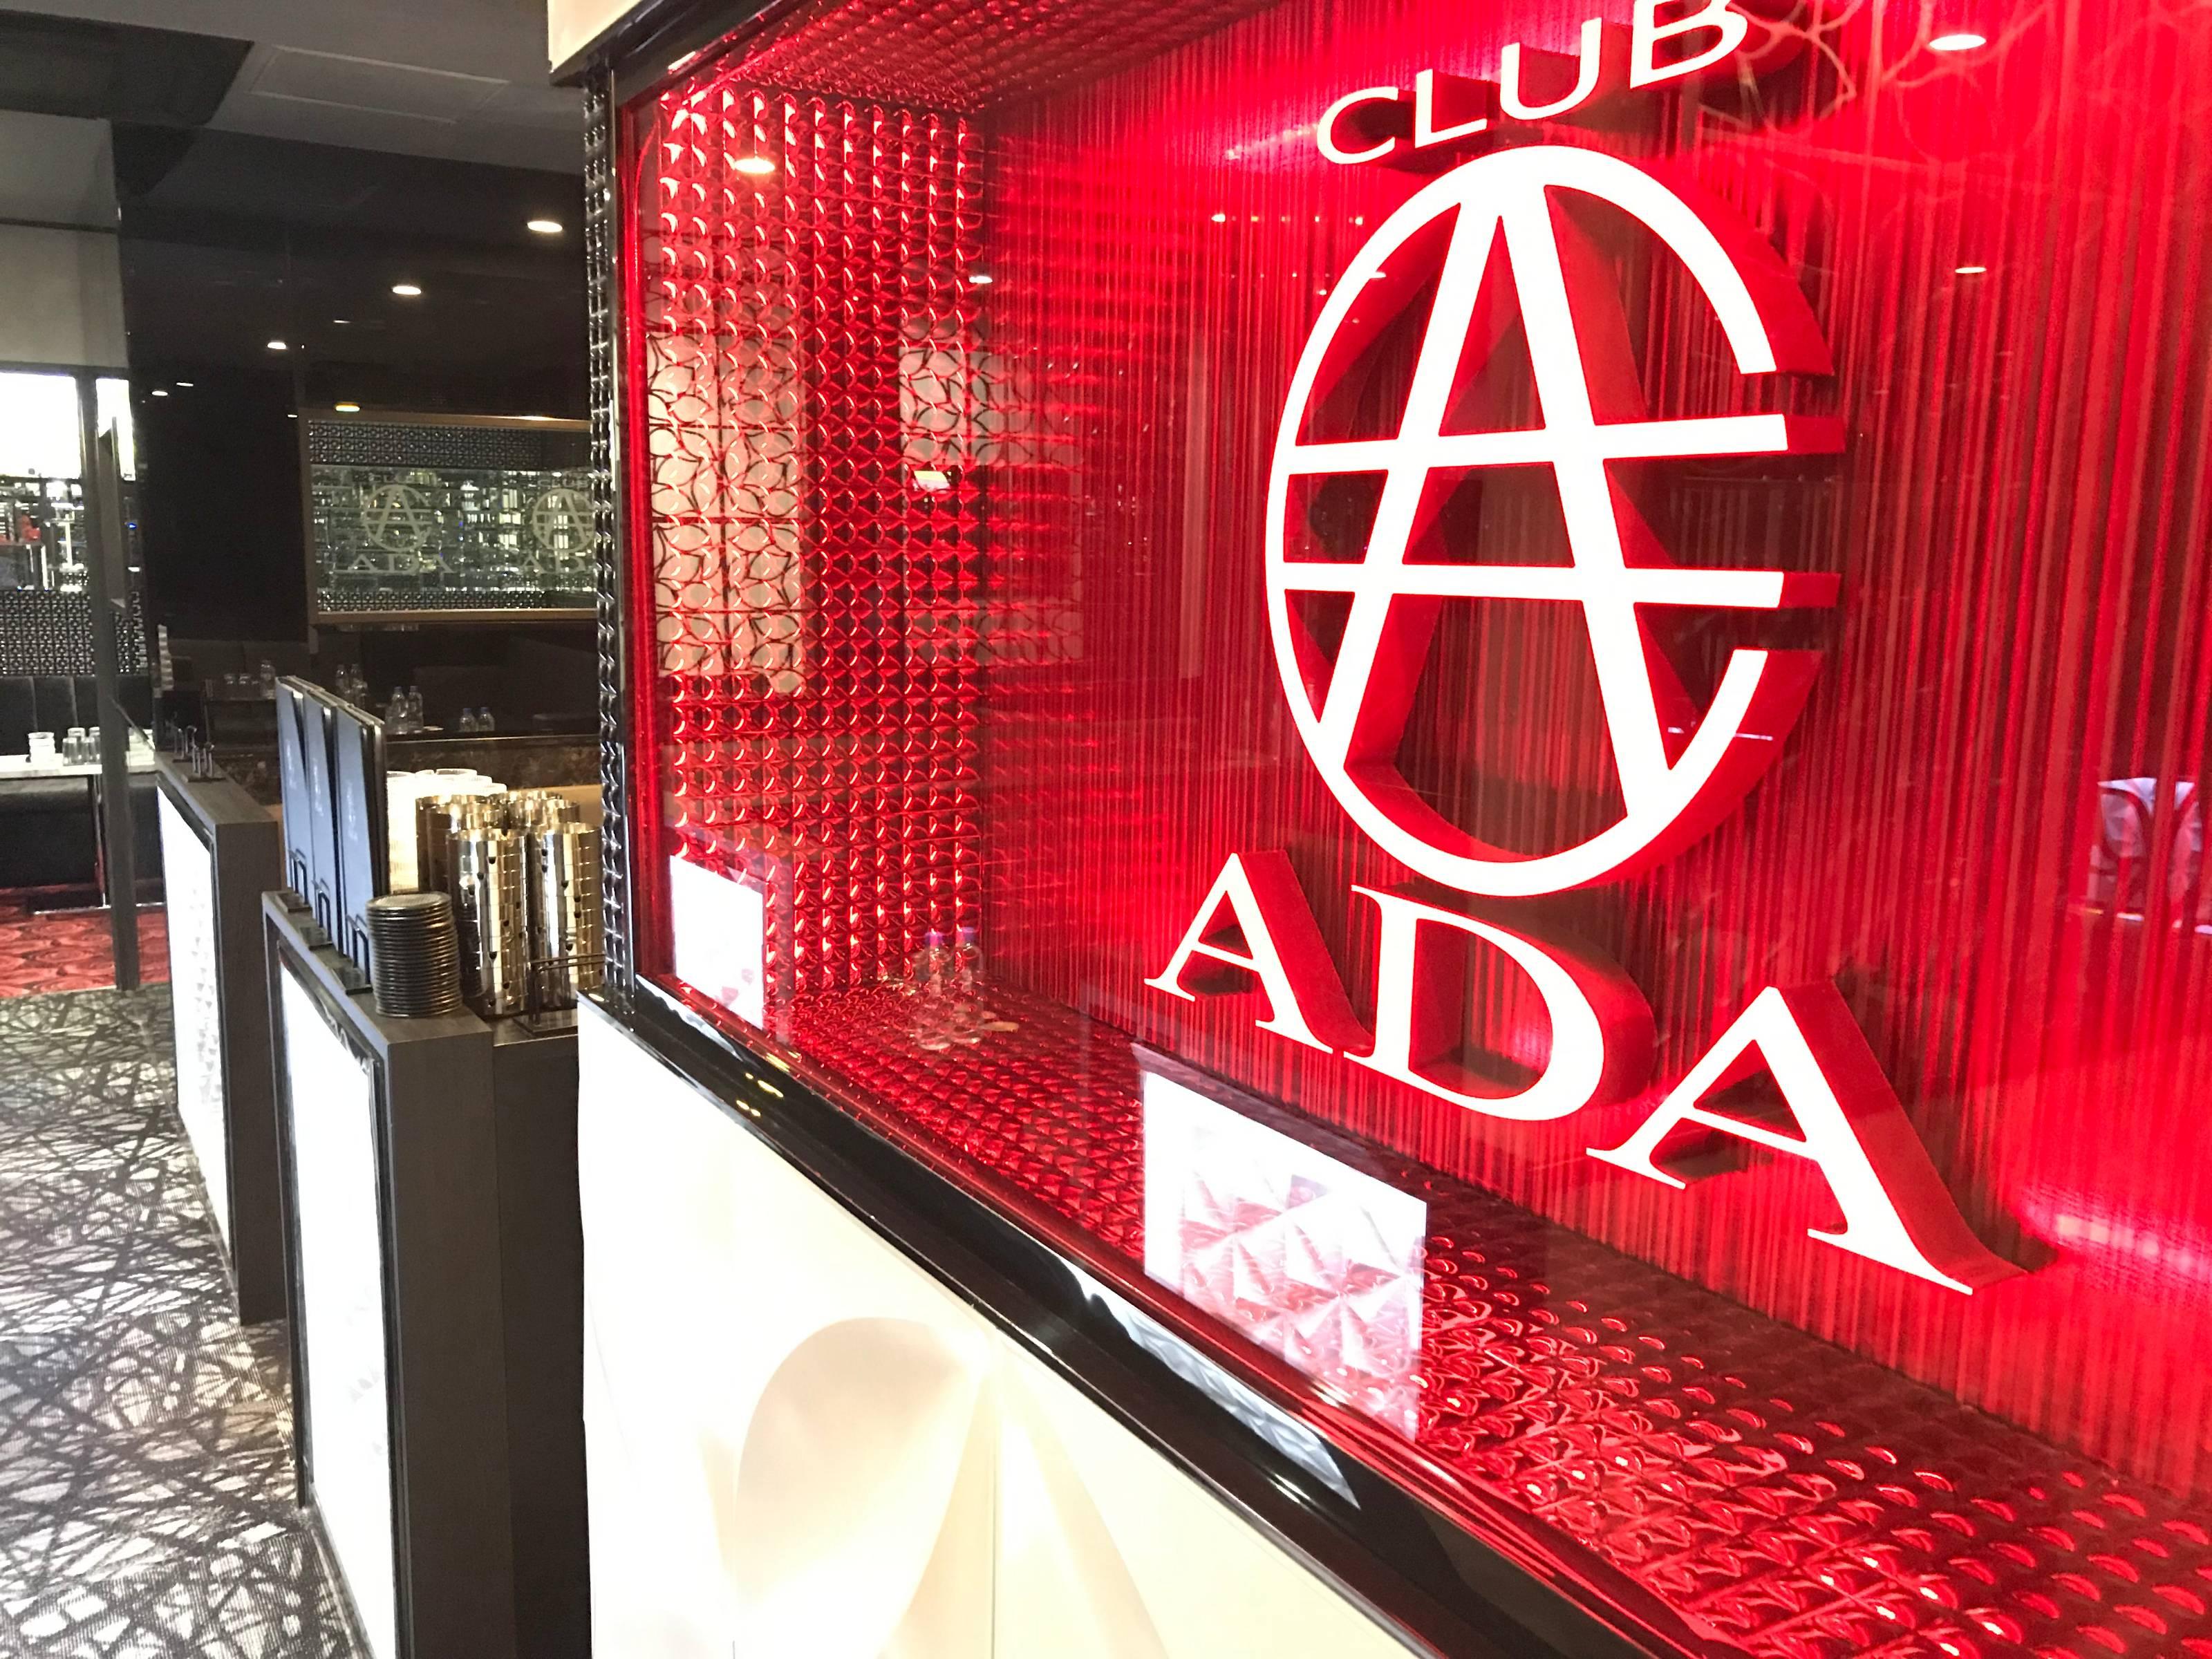 Club ADA (エイダ)